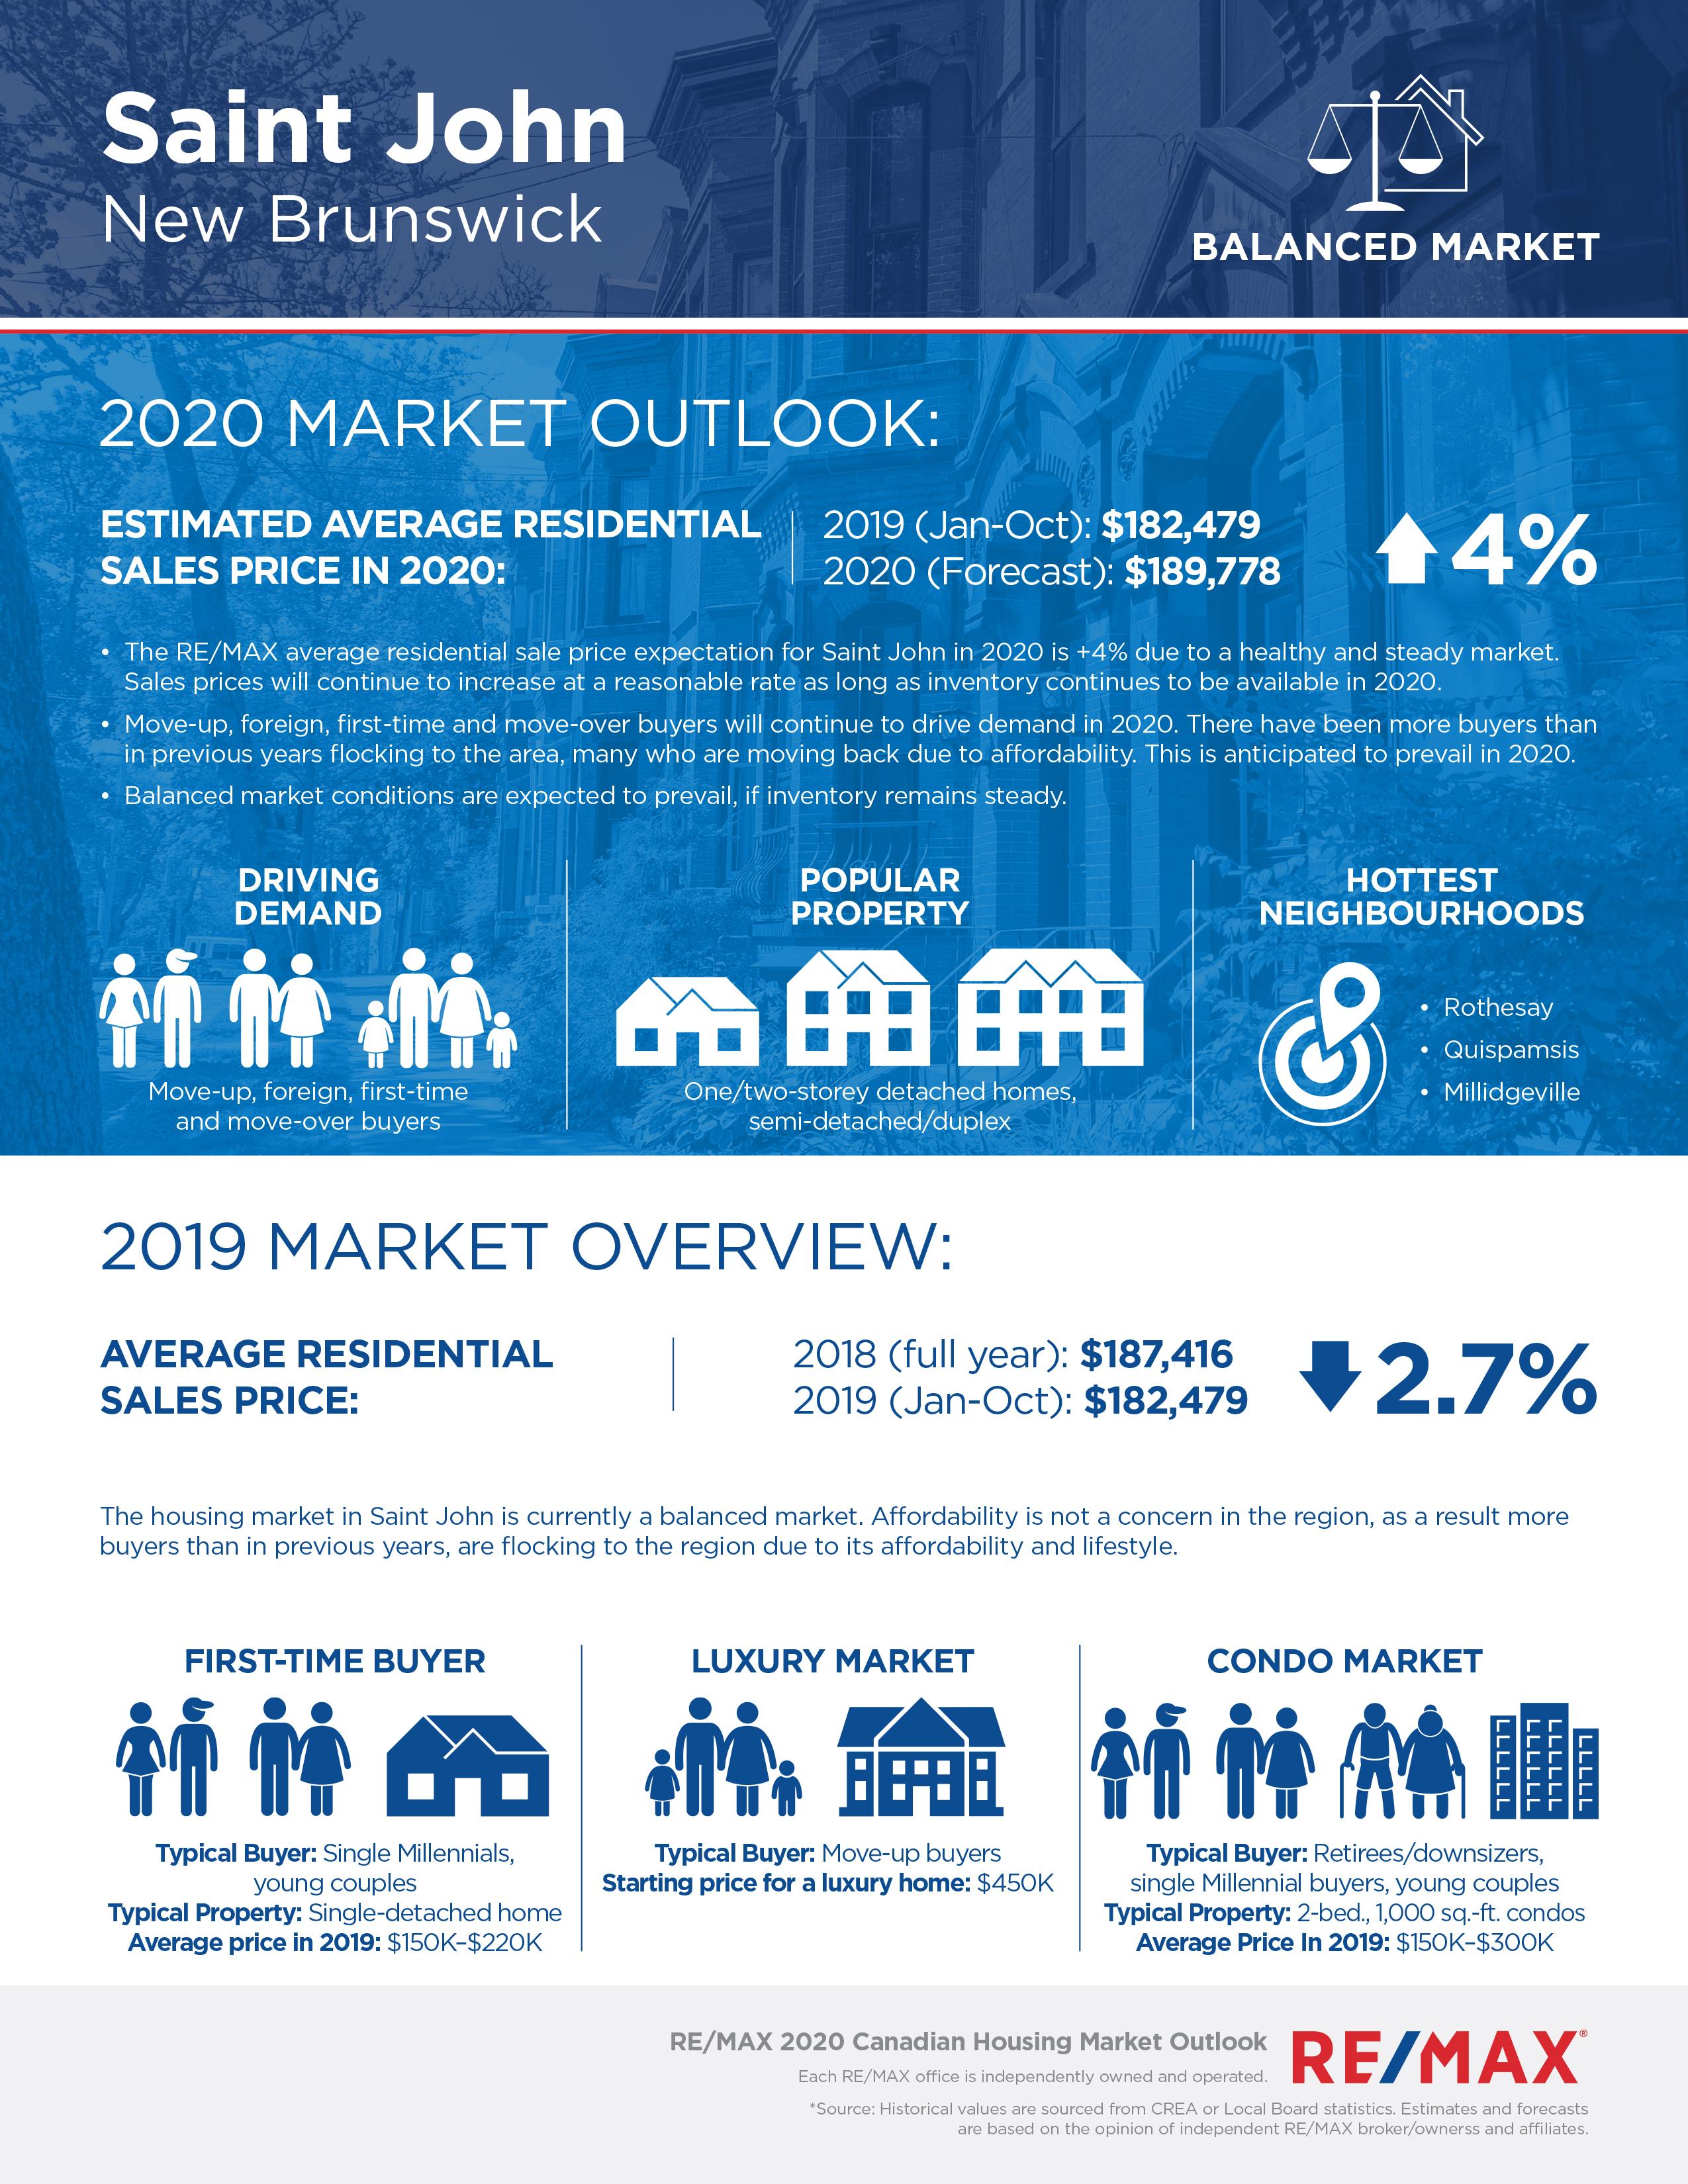 Saint John housing market report